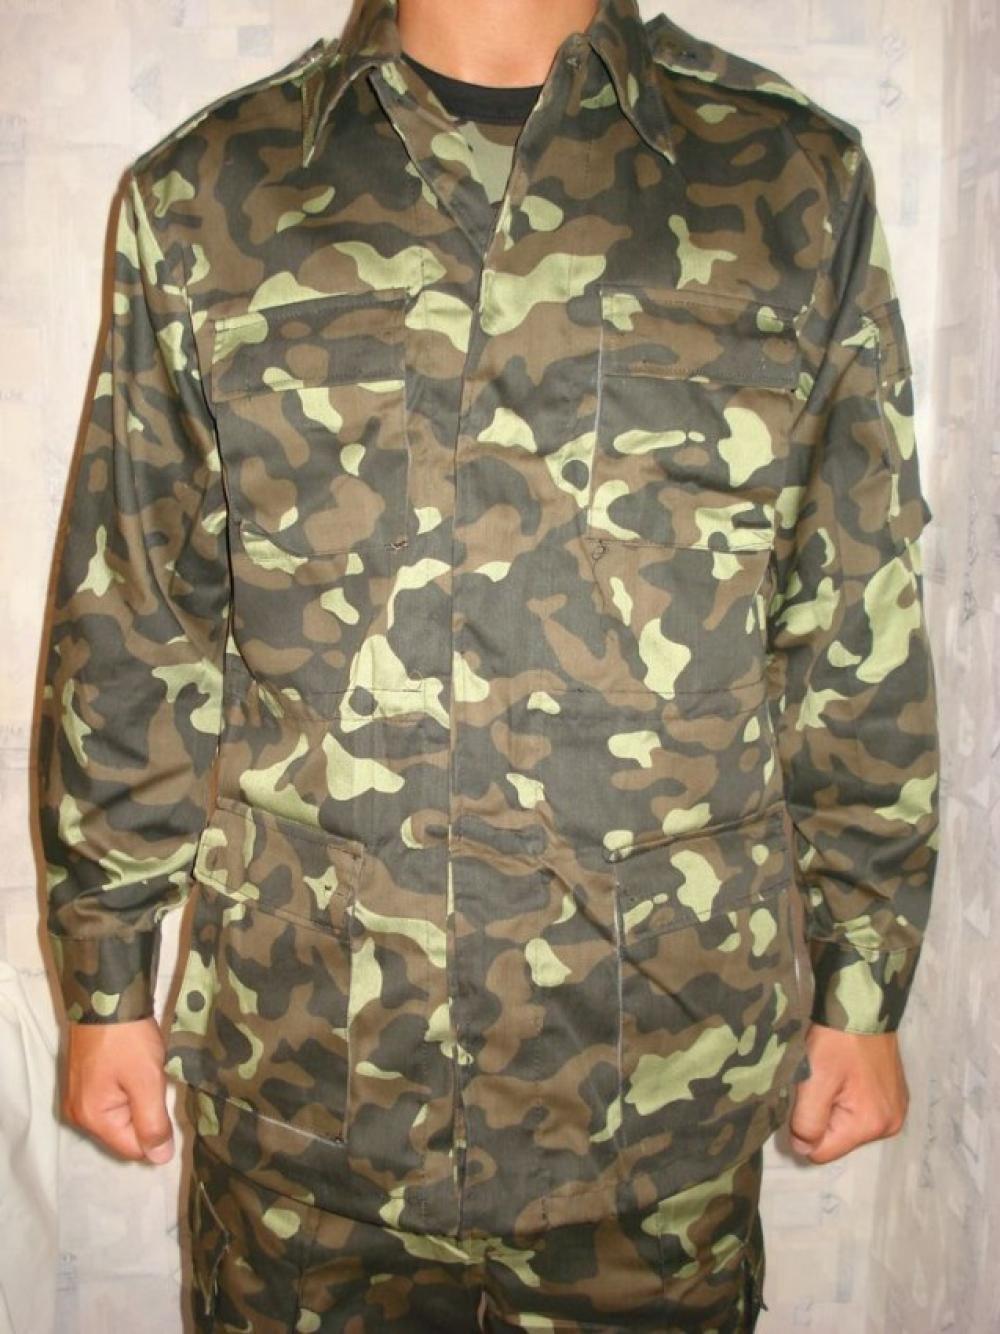 NEW russian olive GORKA 3 4 5 army camo summer cap bdu uniform acu 56 58 59 60